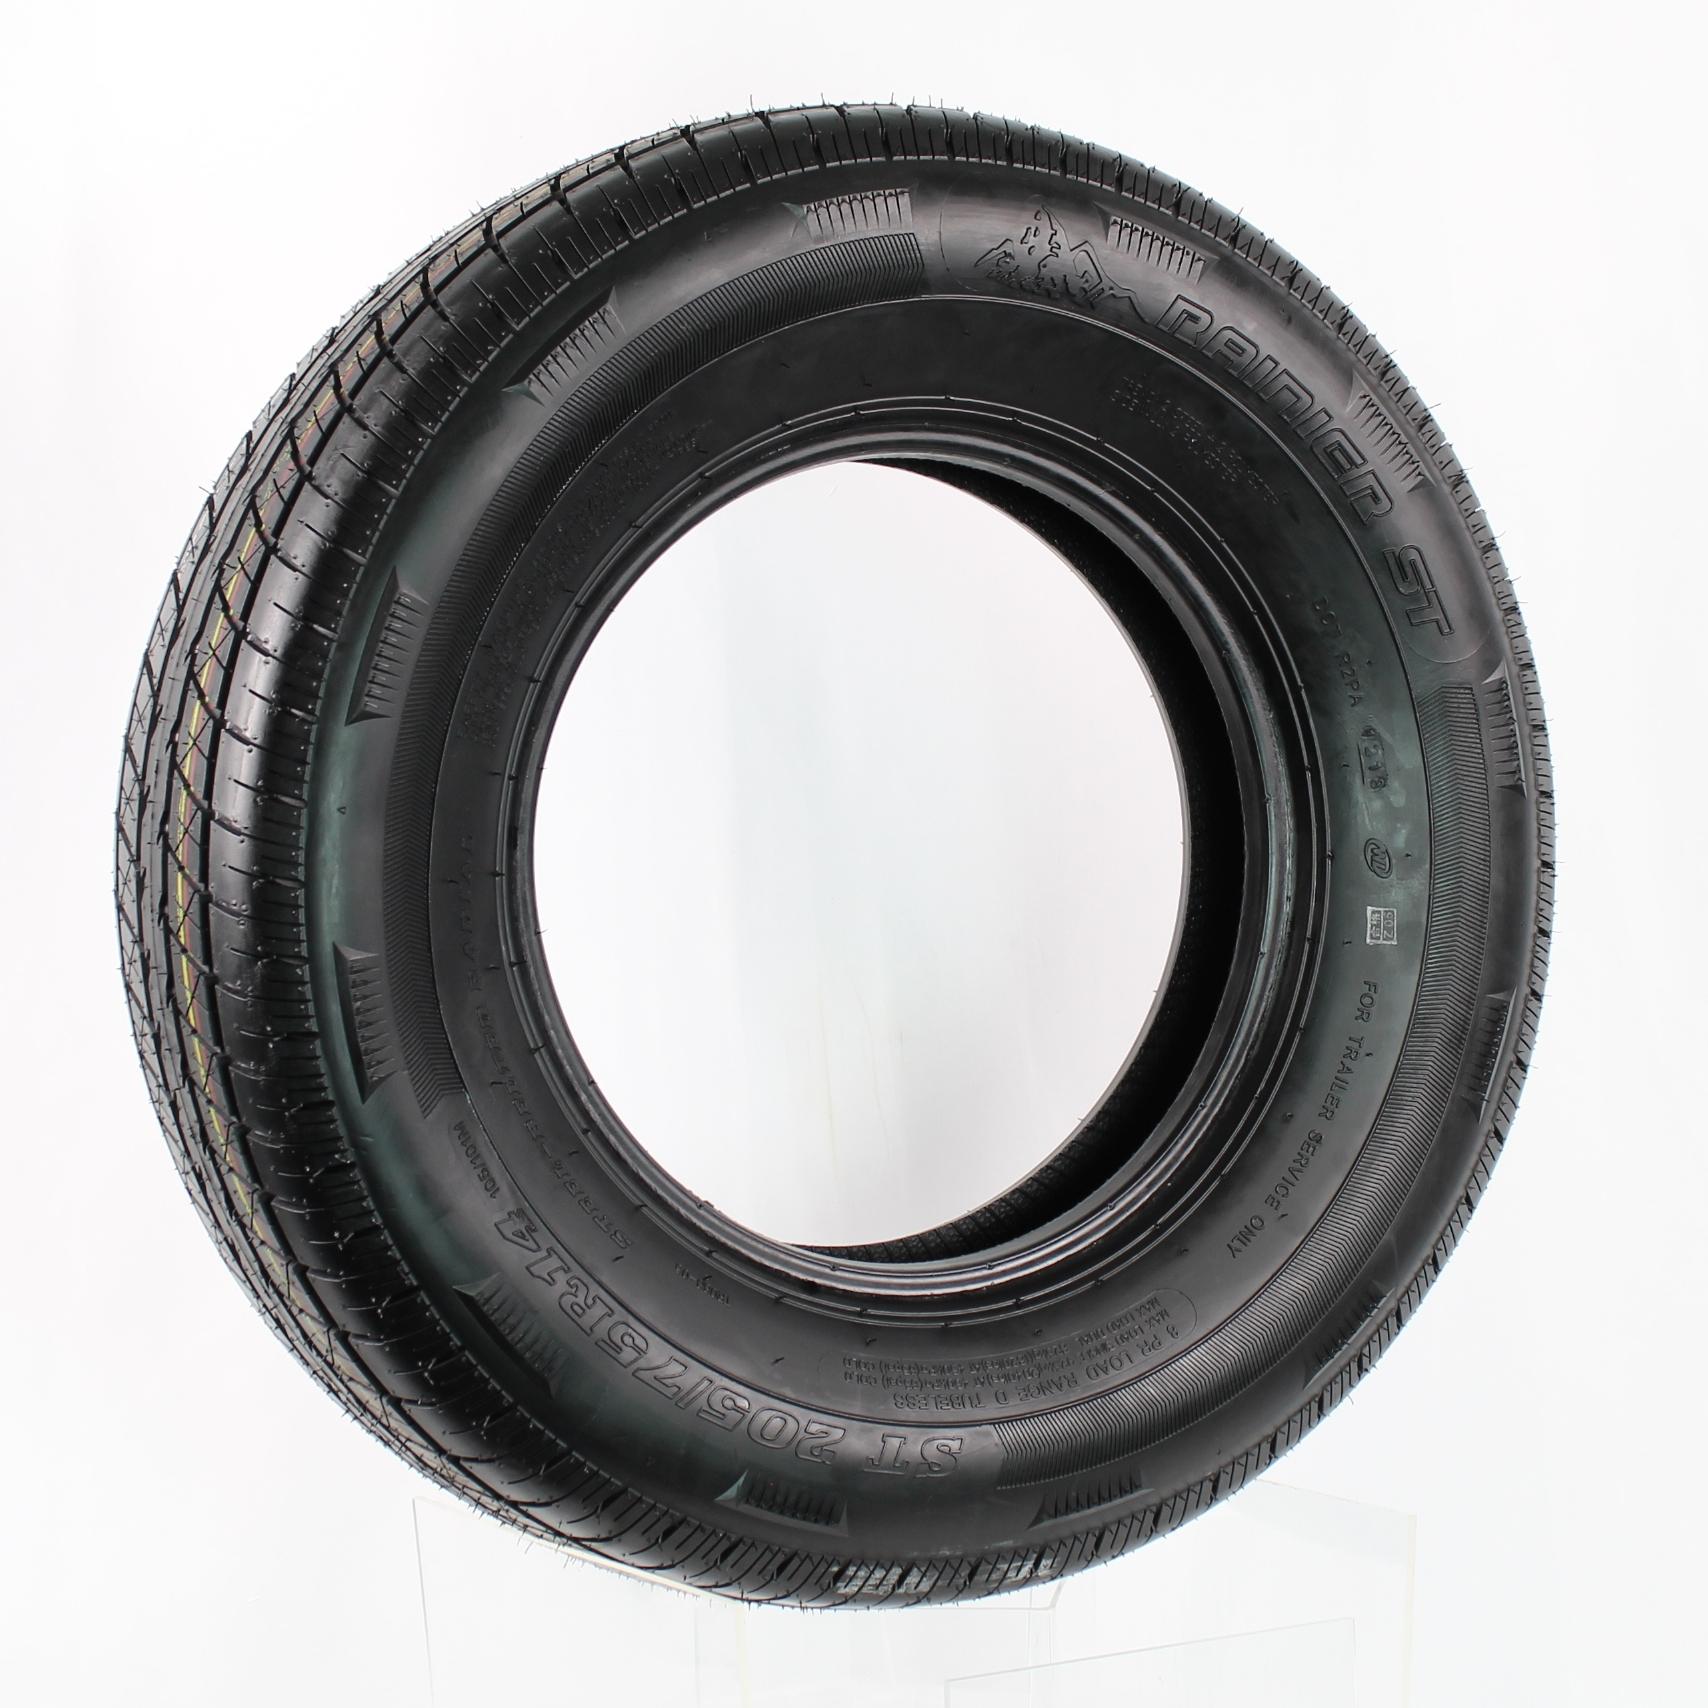 Rainier ST205/75R14 LRD 8-Ply Radial Trailer Tire Image